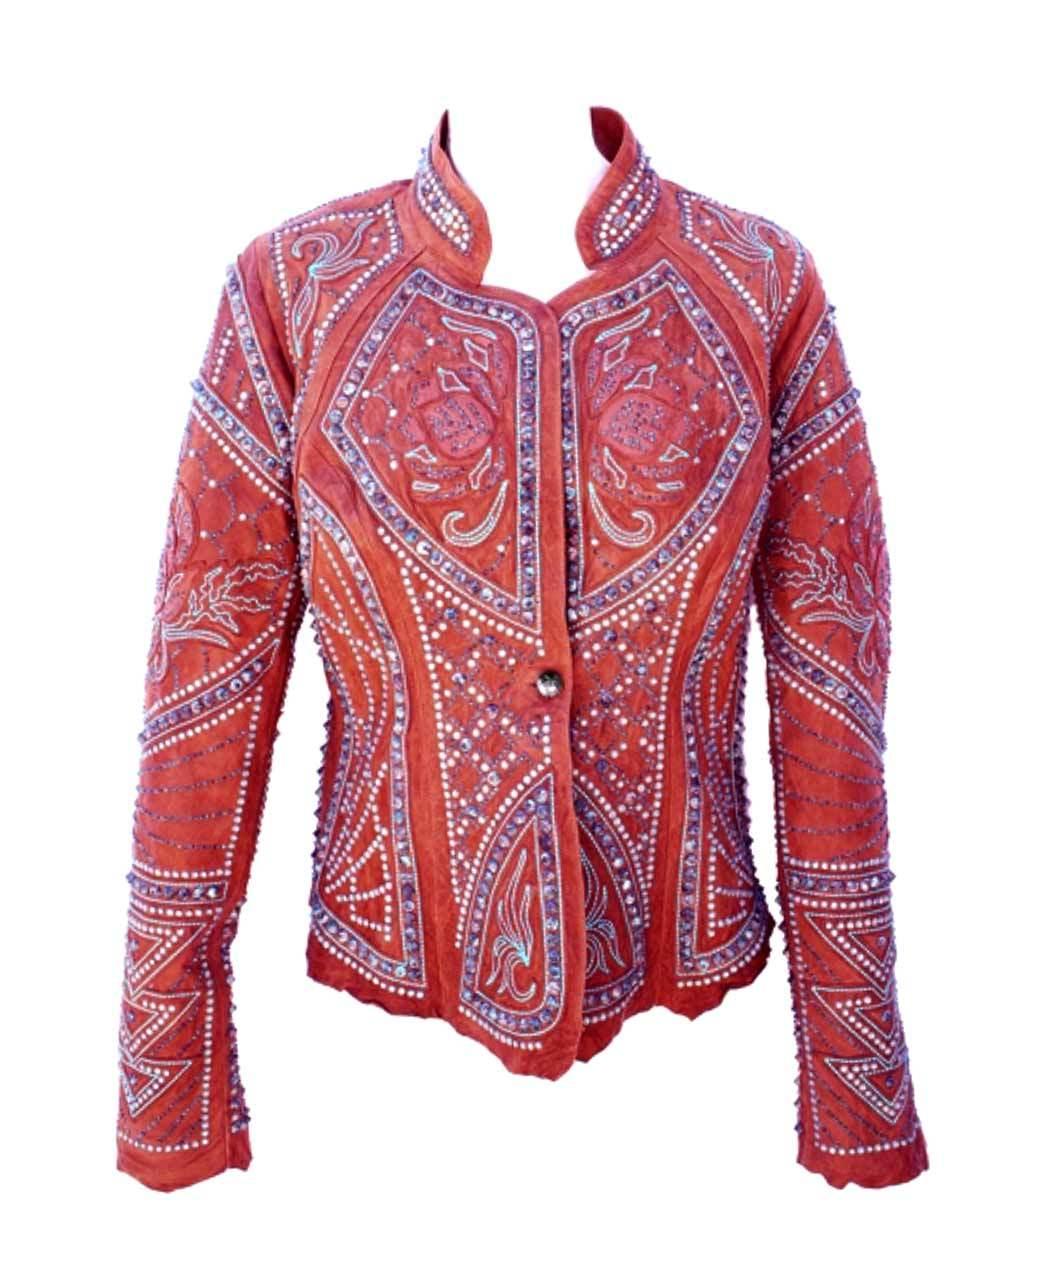 Kippys Ceremonial Skin Cognac Borello Leather Jacket